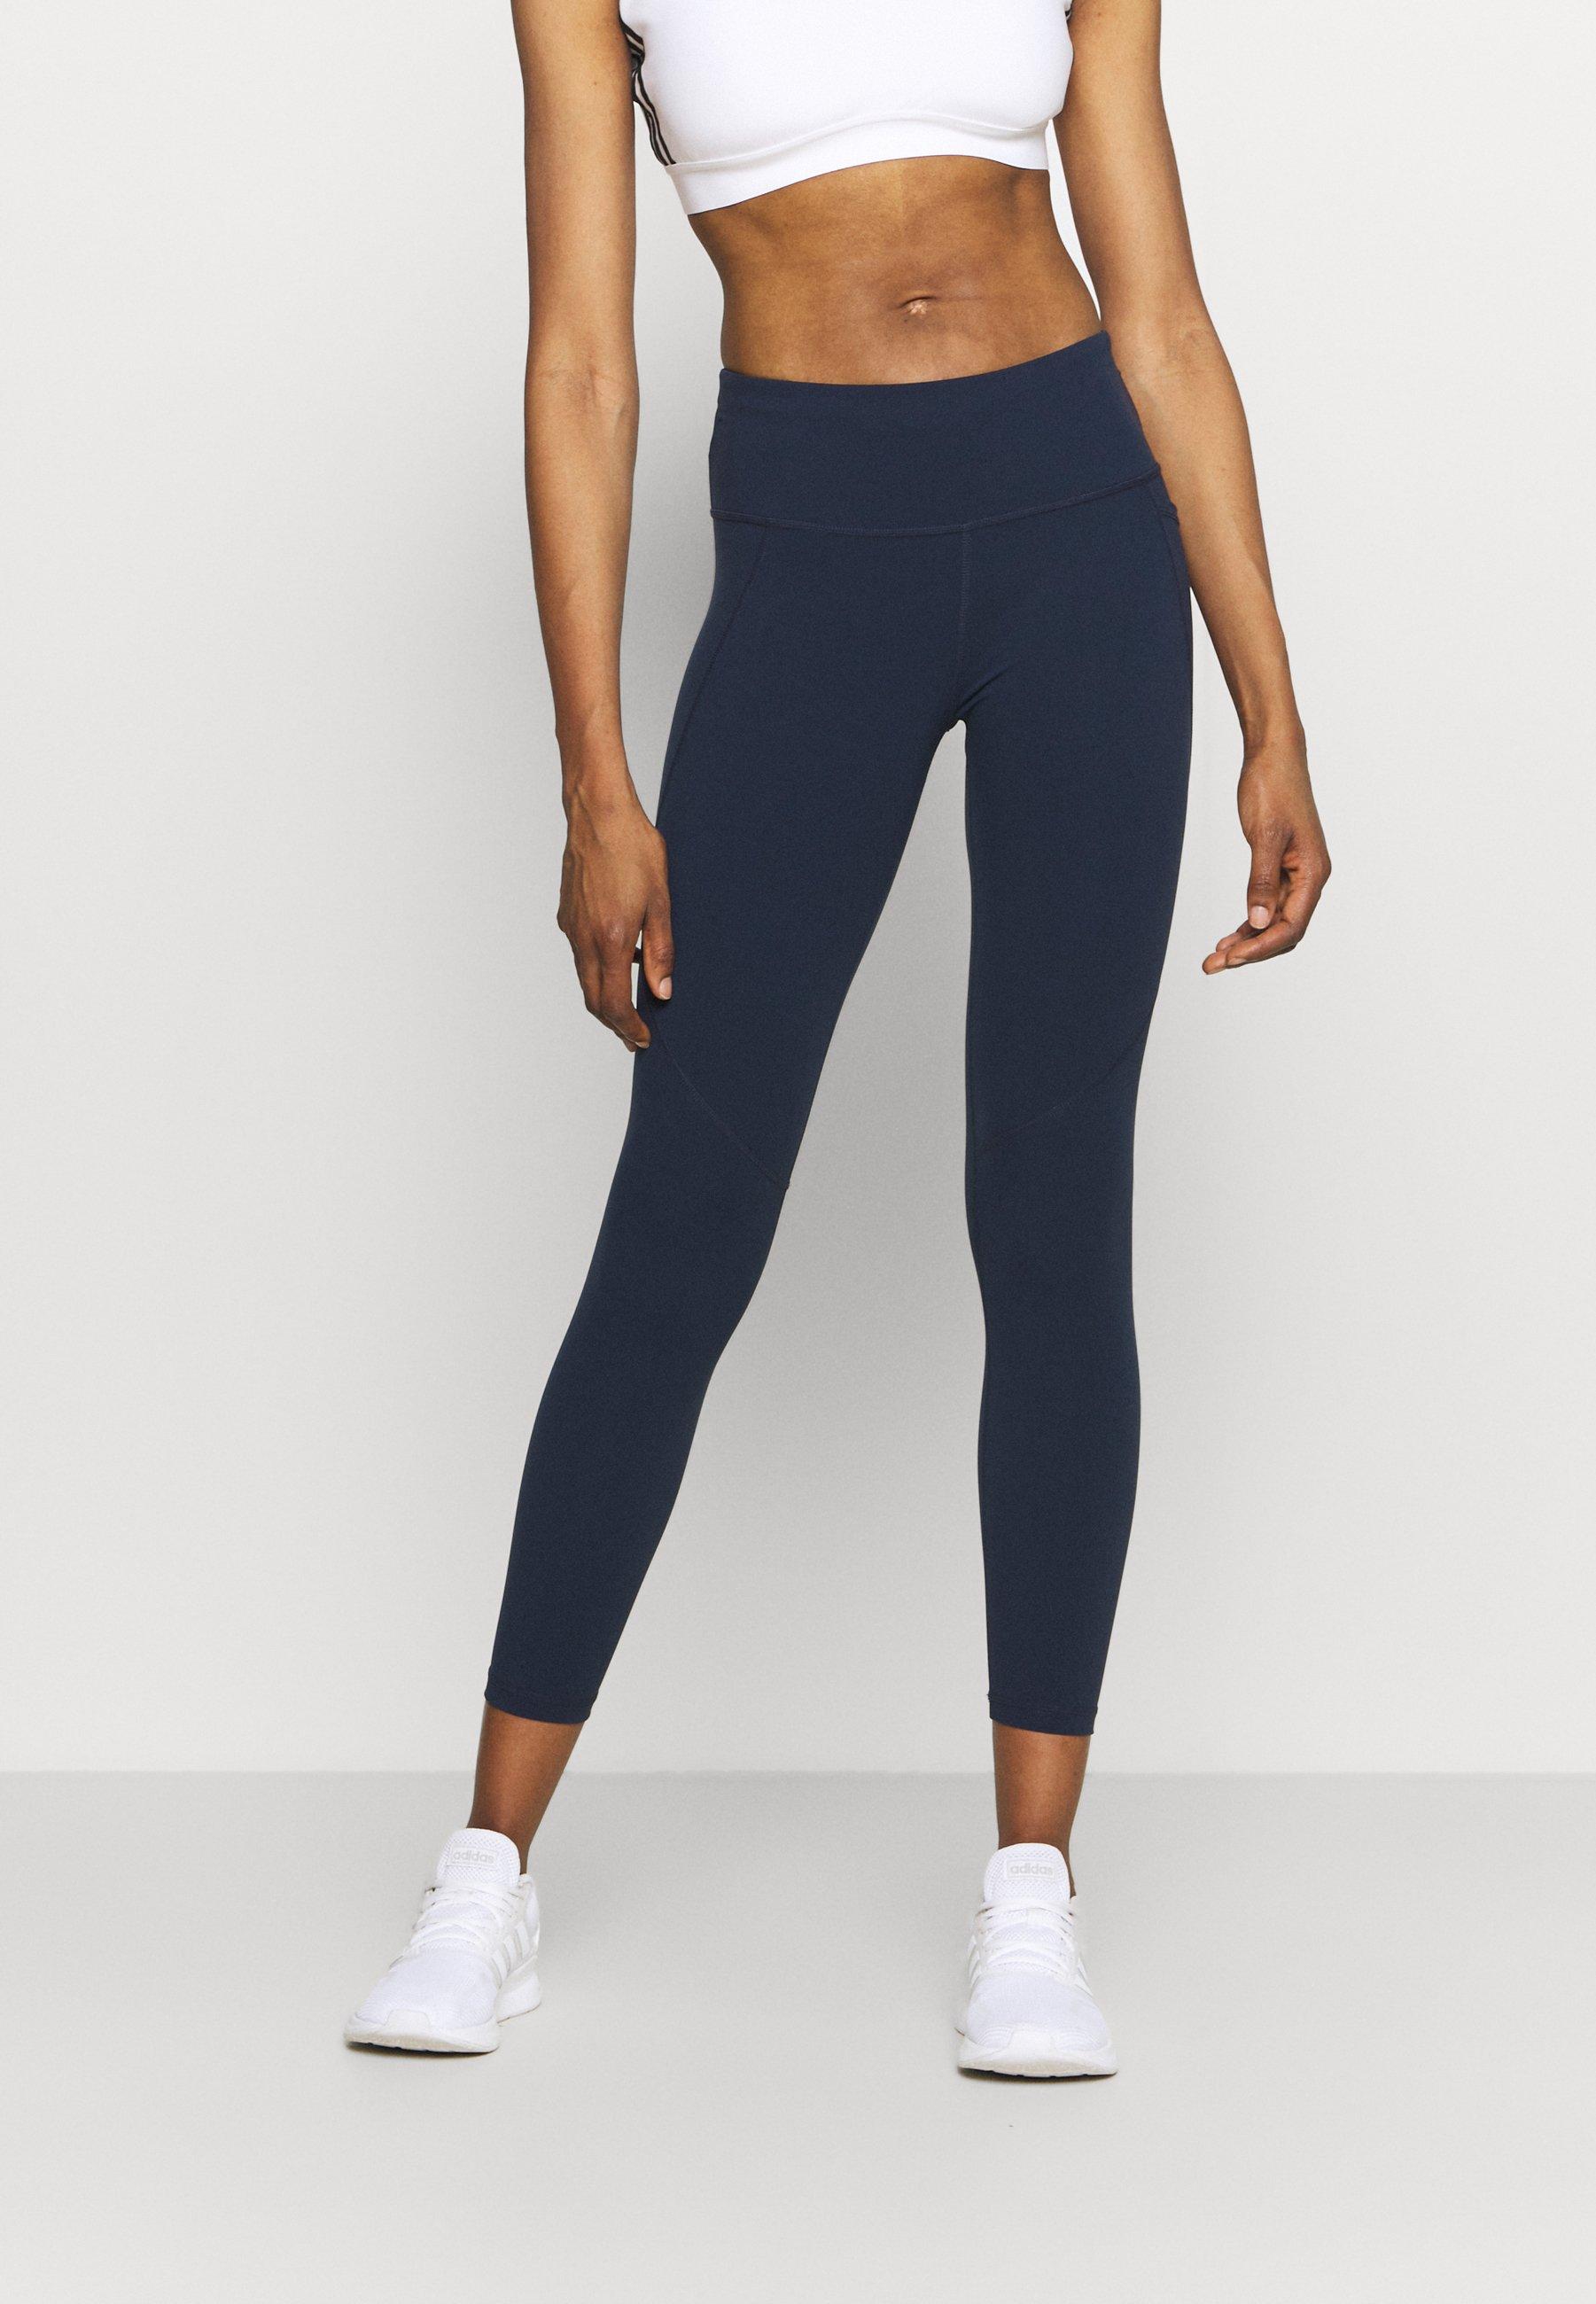 Femme POWER WORKOUT 7/8 LEGGINGS - Collants